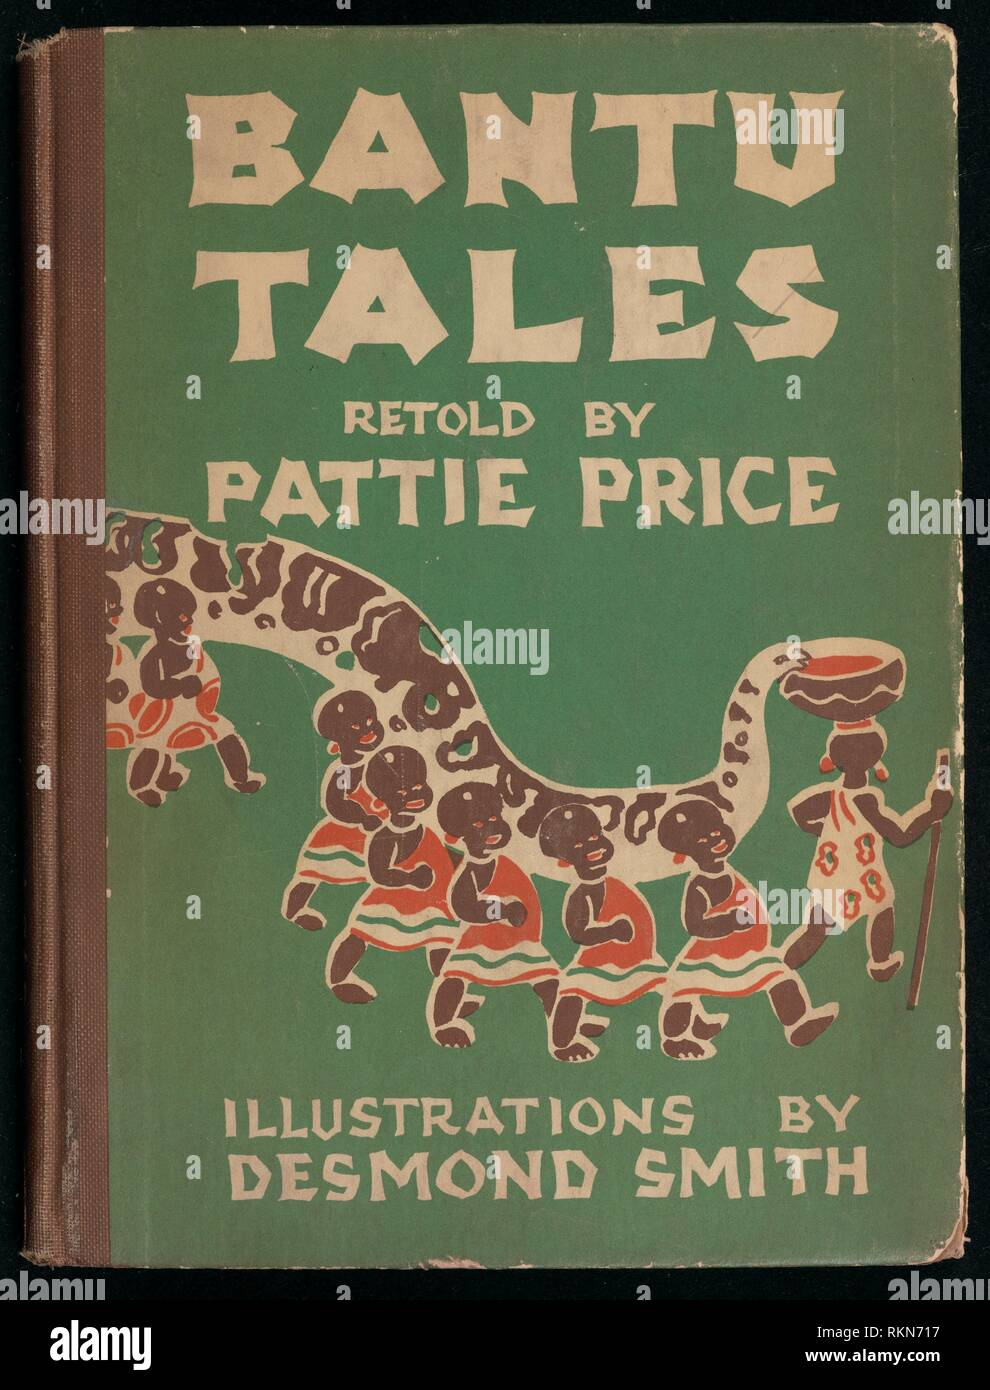 childrens literature illustration stock photos childrens